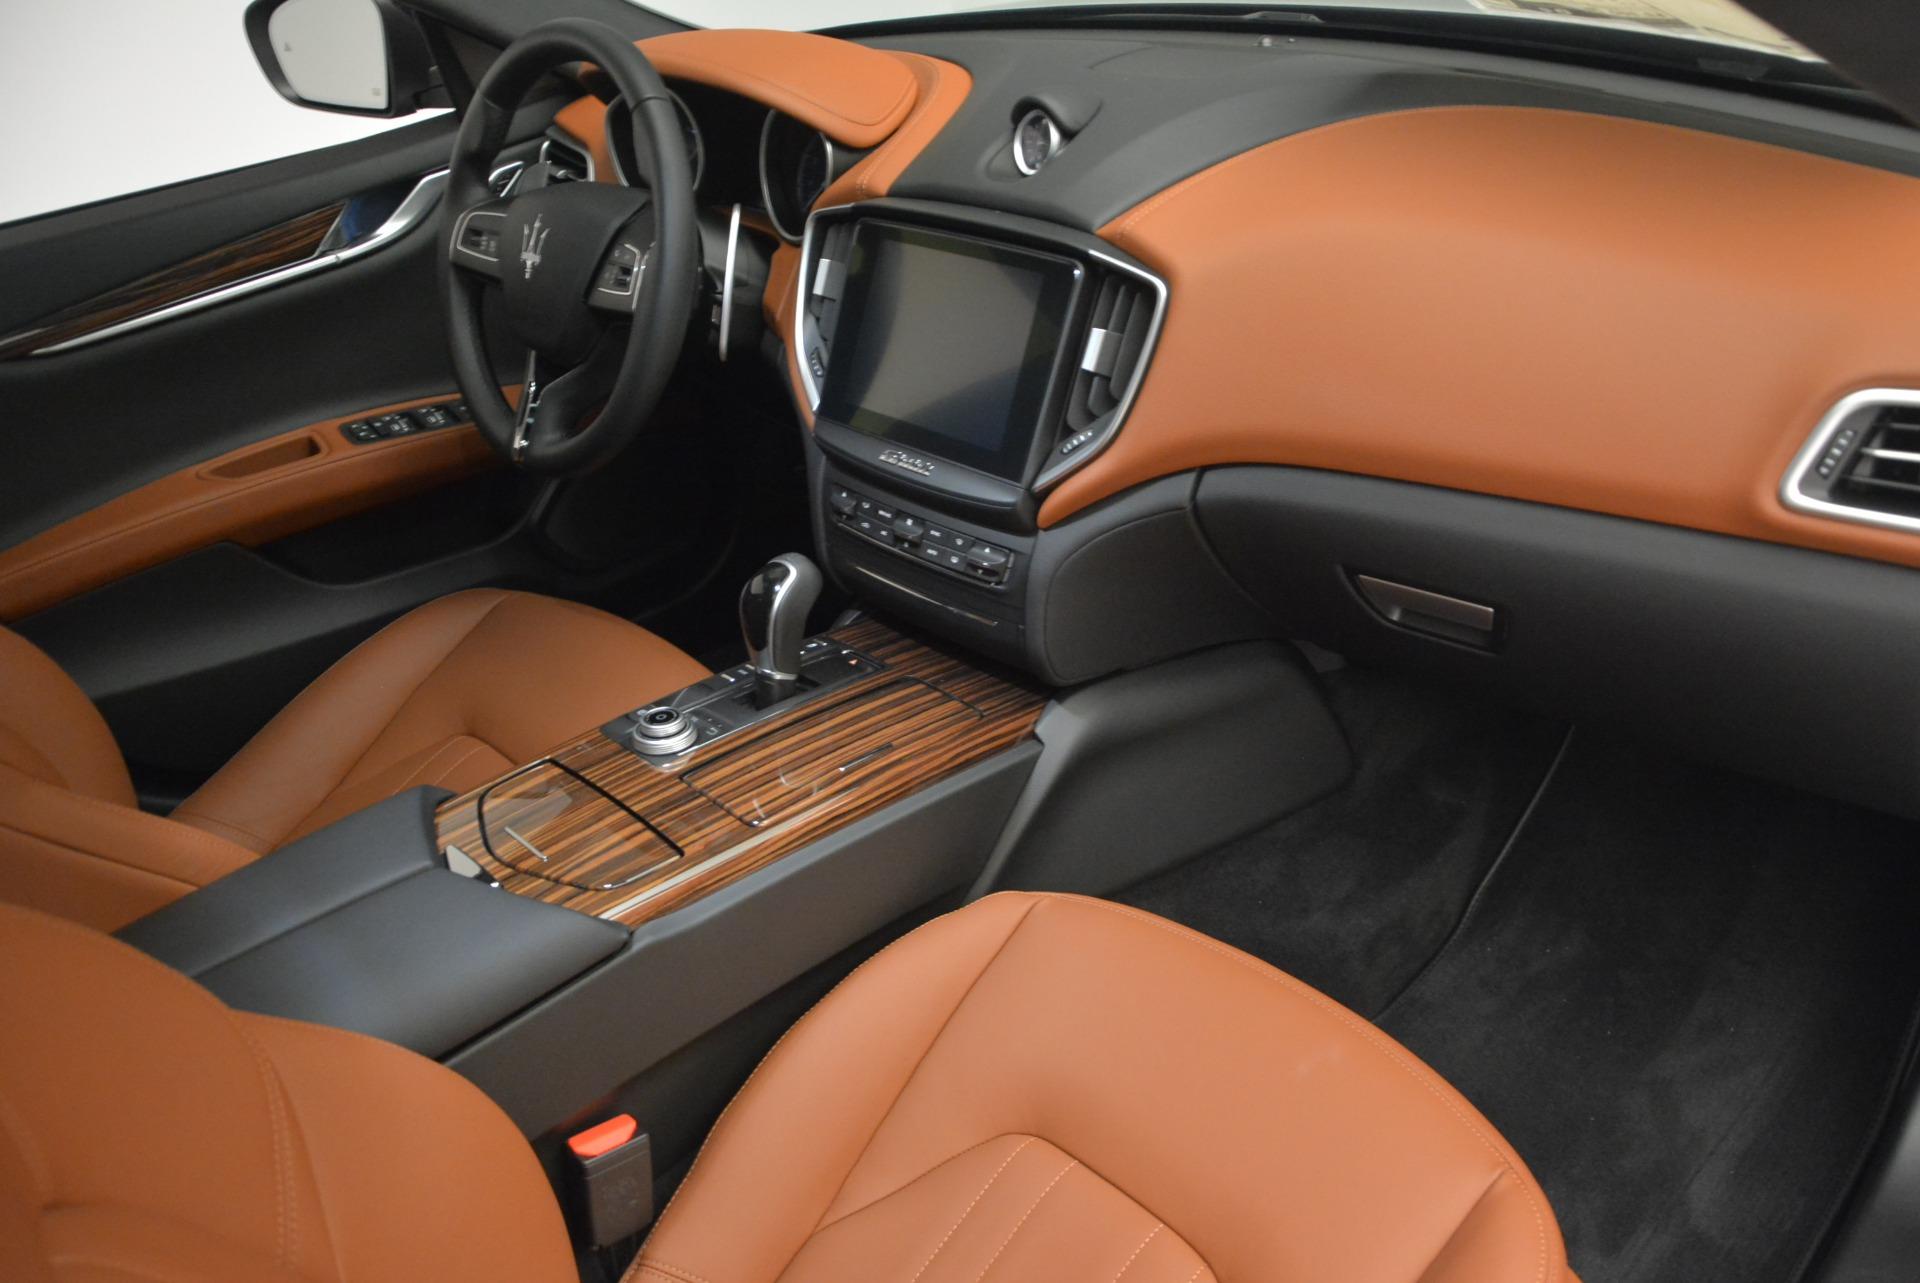 Used 2017 Maserati Ghibli S Q4 EX-LOANER For Sale In Greenwich, CT 608_p20